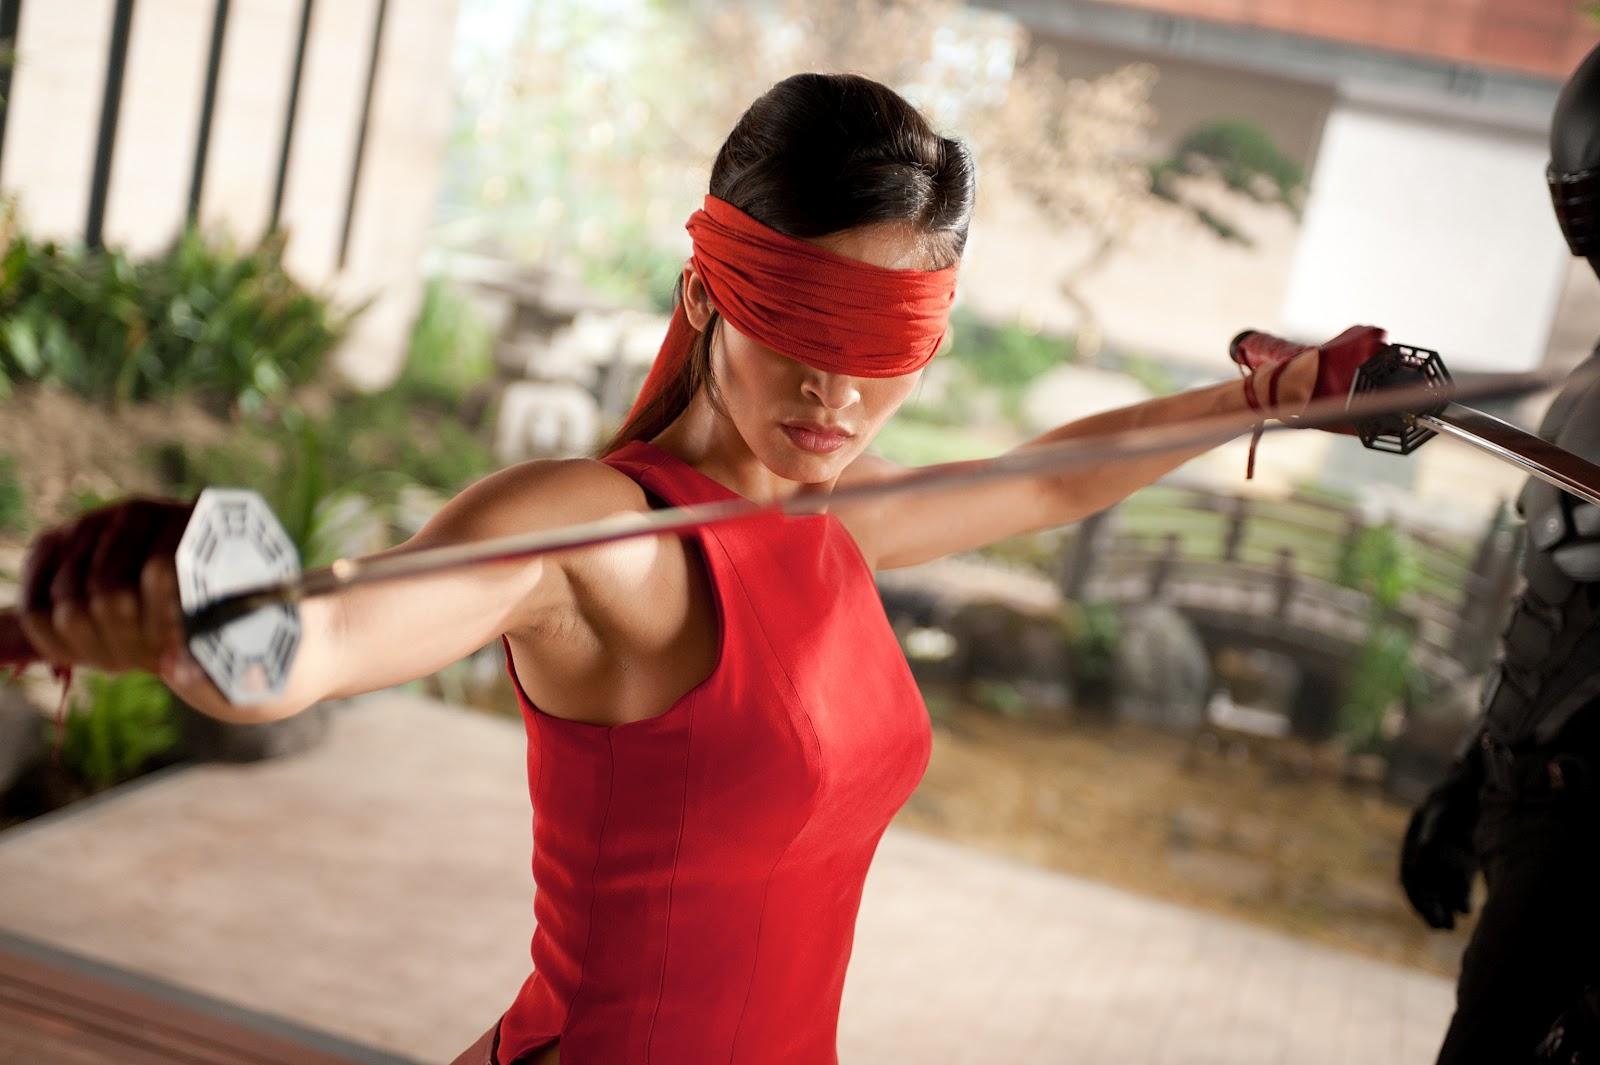 elodie yung in gi joe retaliation wallpapers - Elodie Yung in GI Joe Retaliation Wallpapers HD Wallpapers